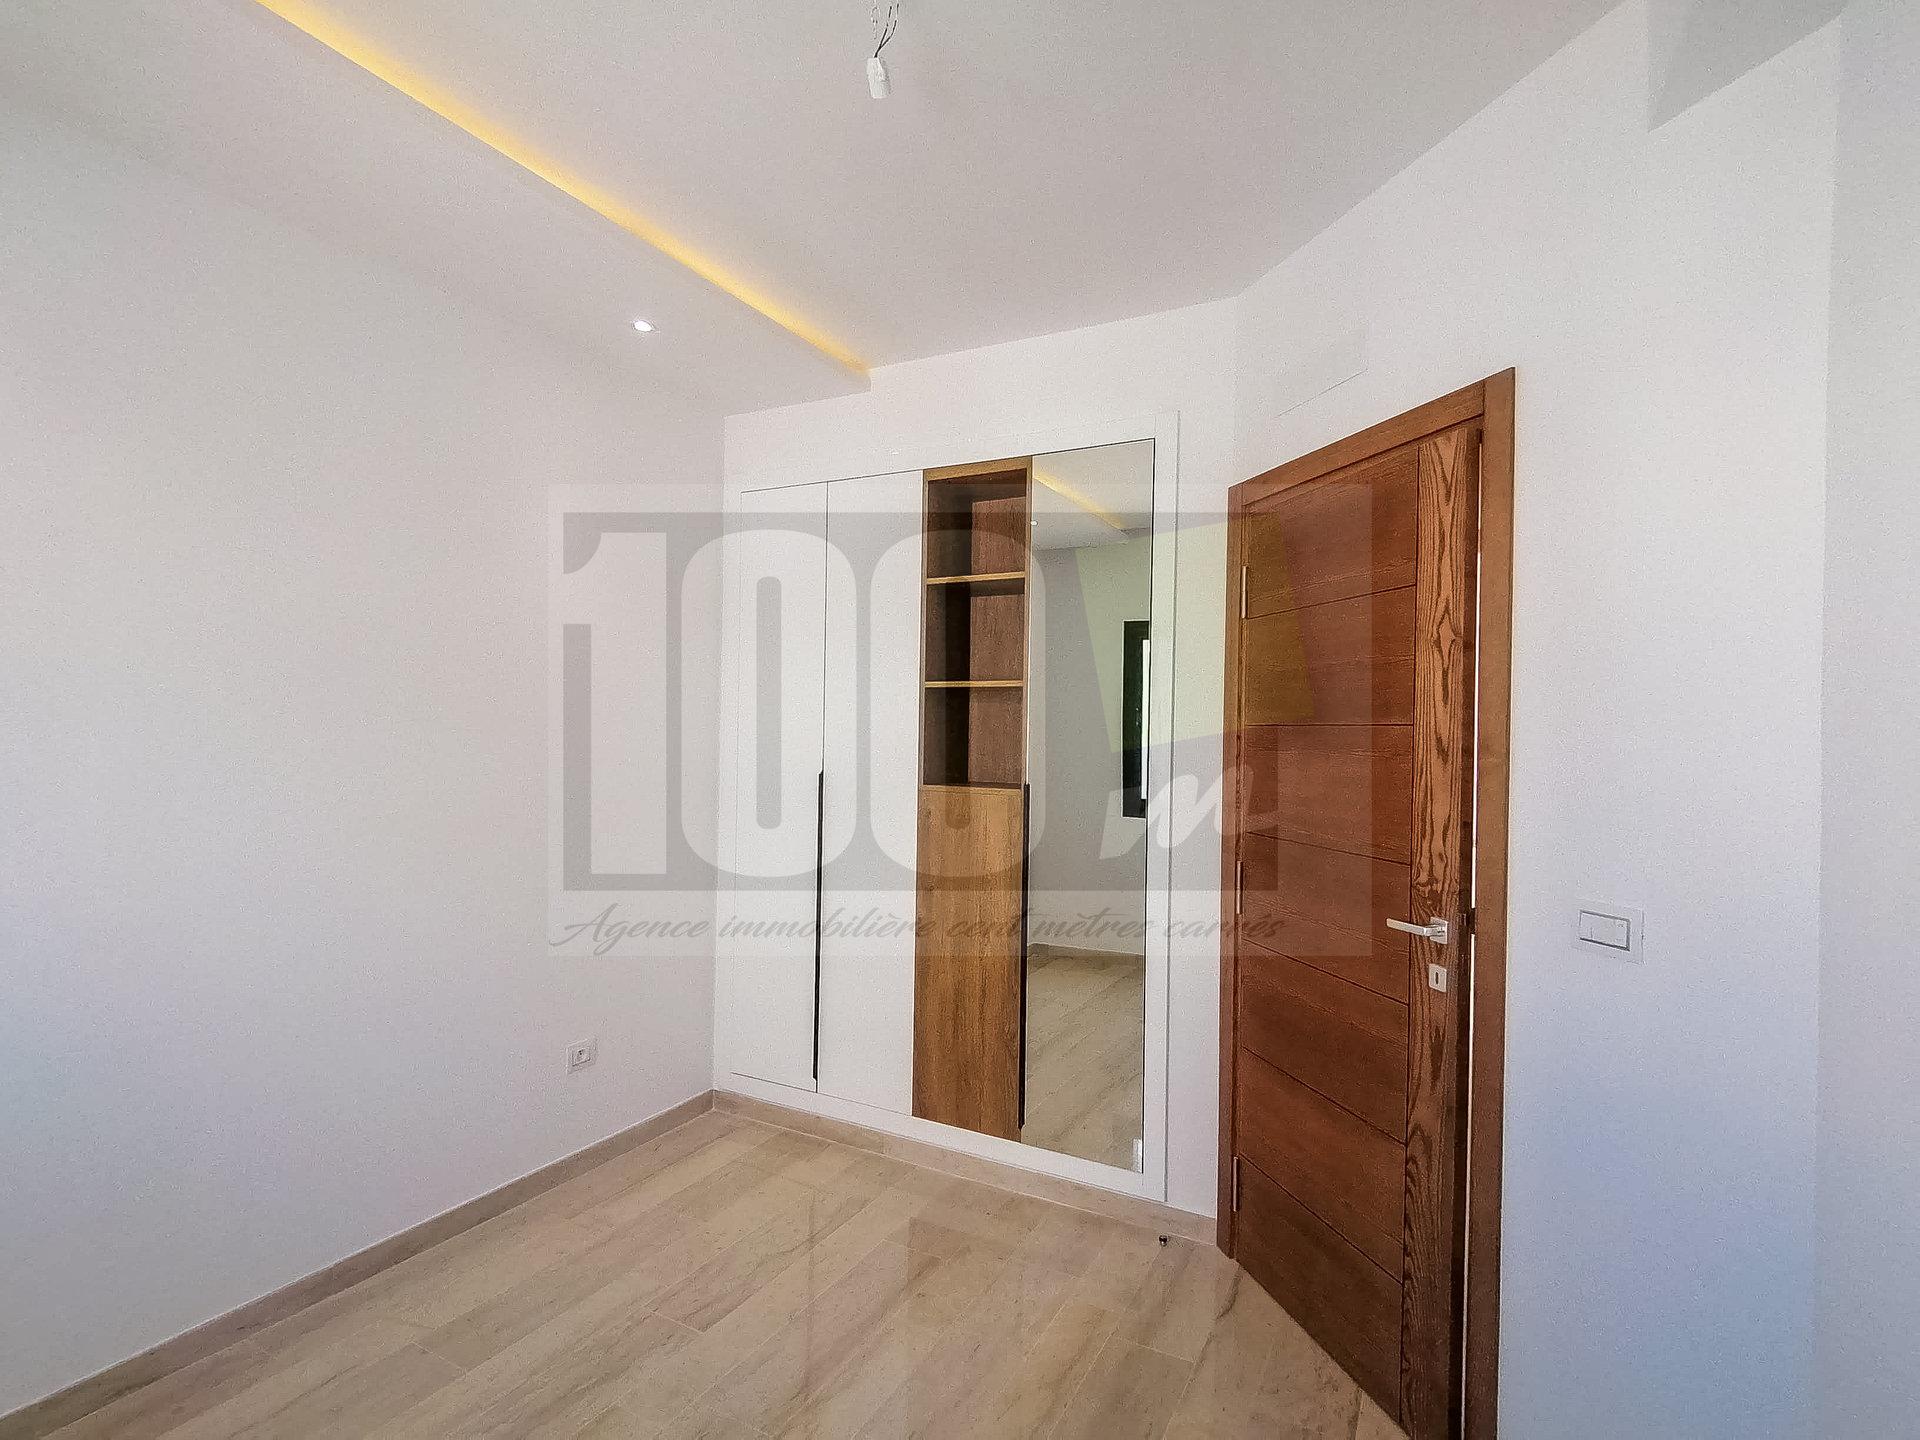 Vente appartement S+1 à Kheireddine la Goulette